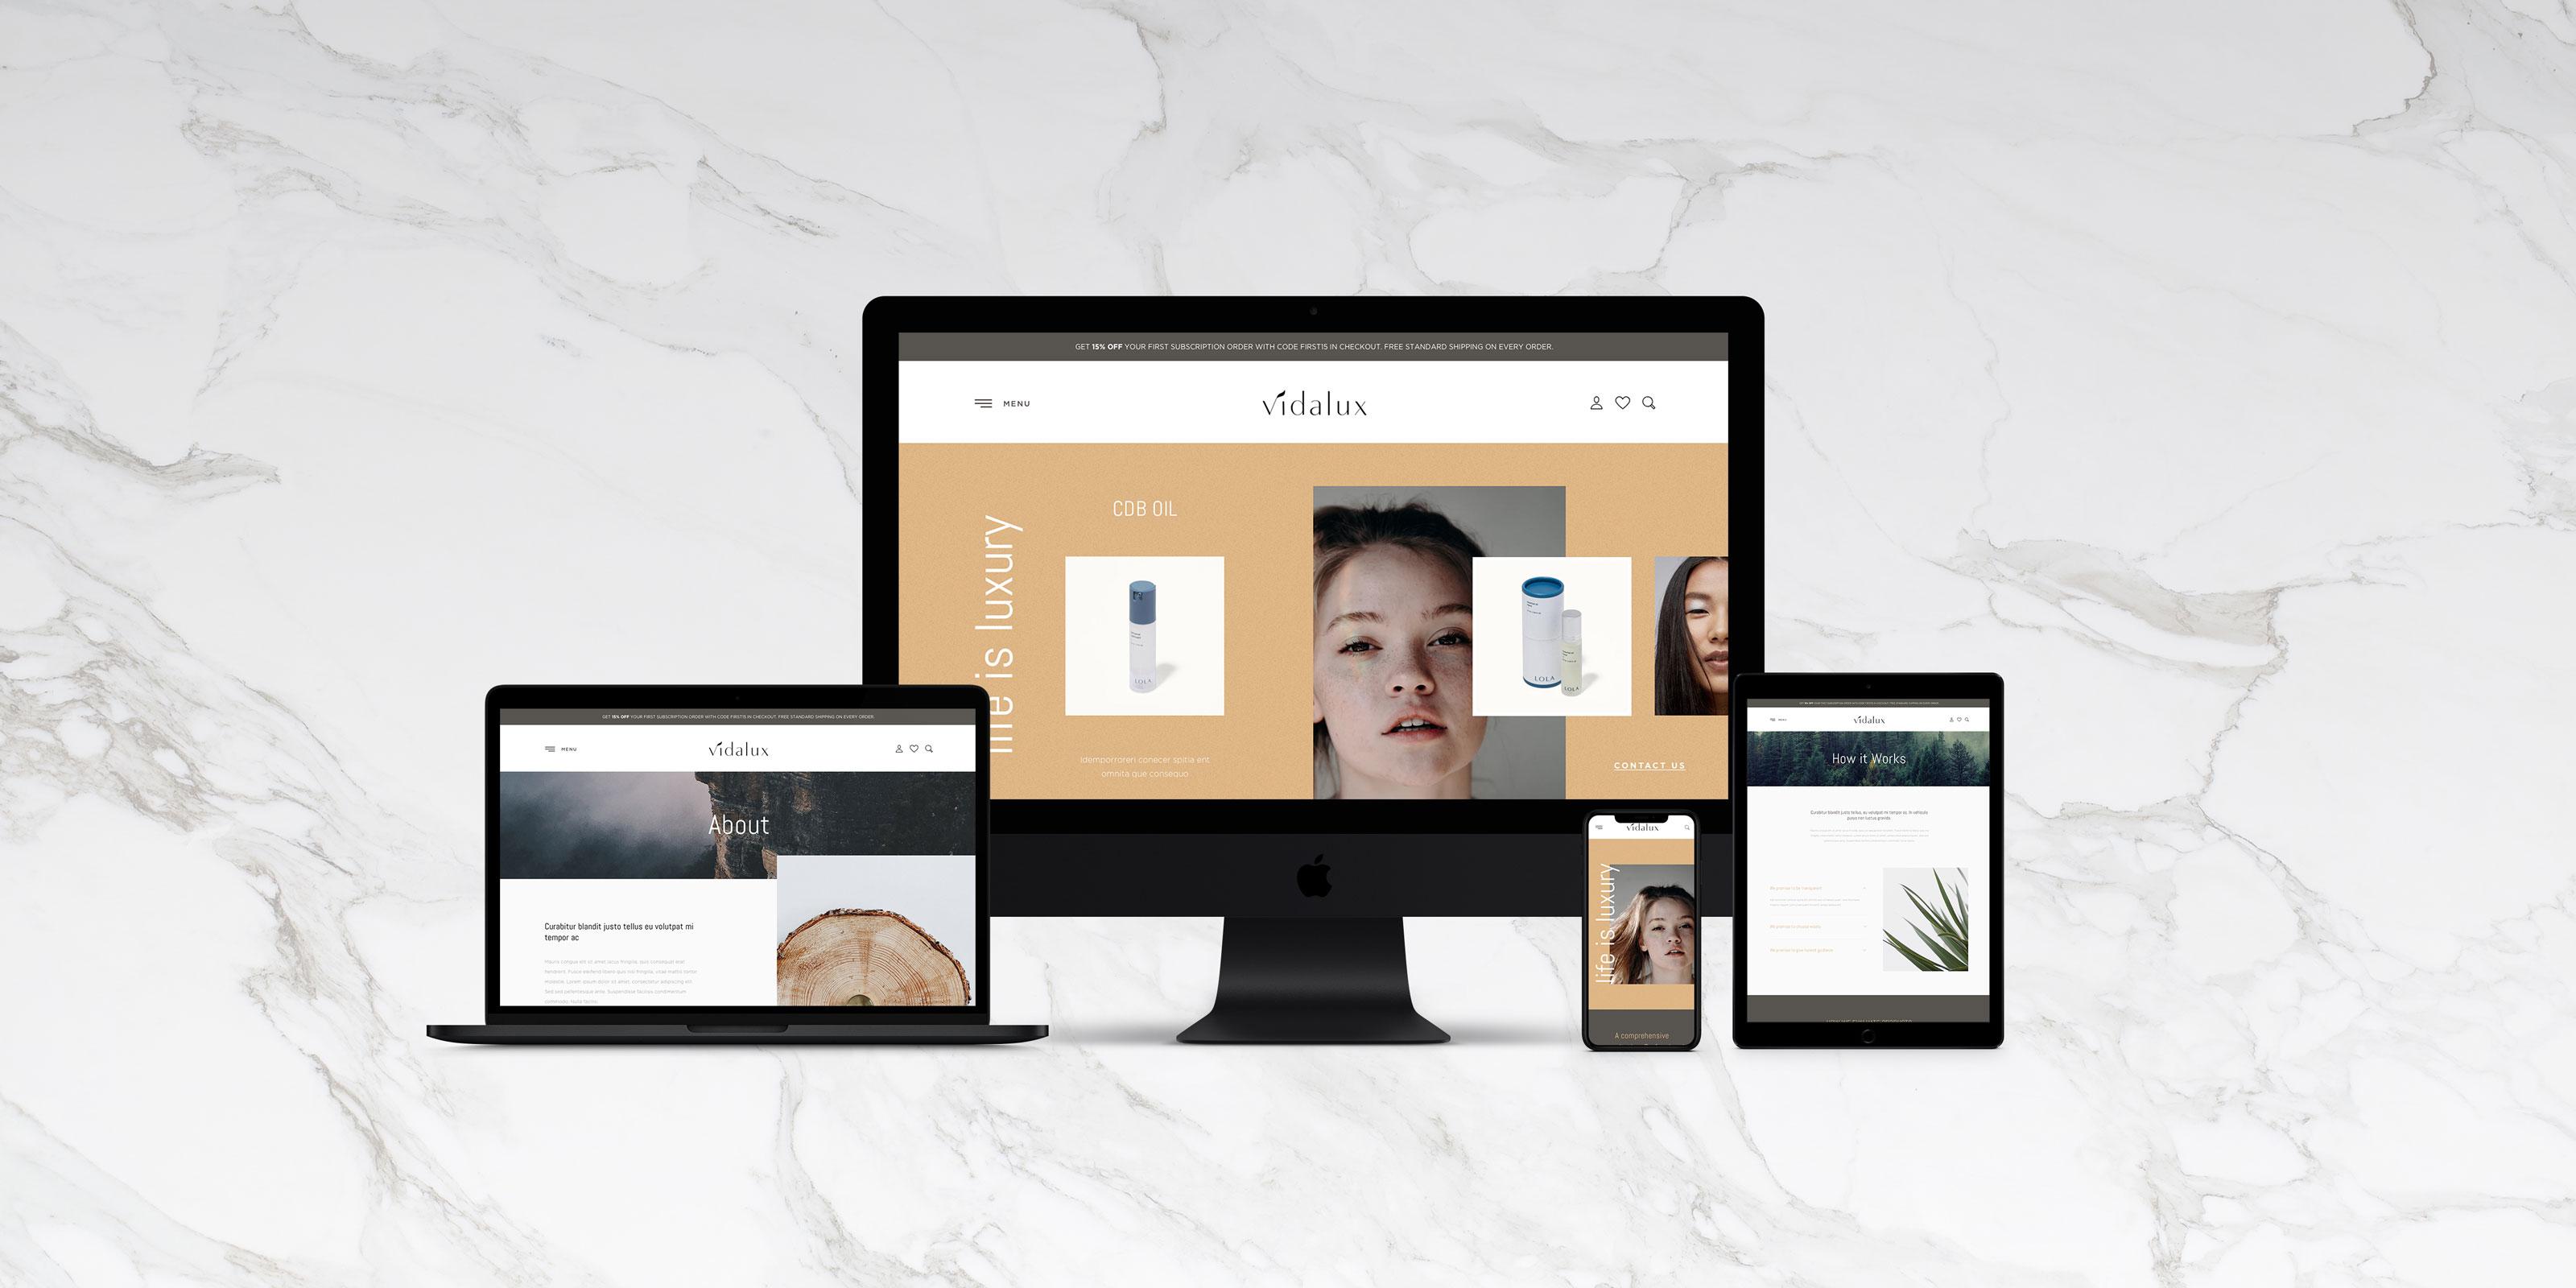 vidalux-website-mockup